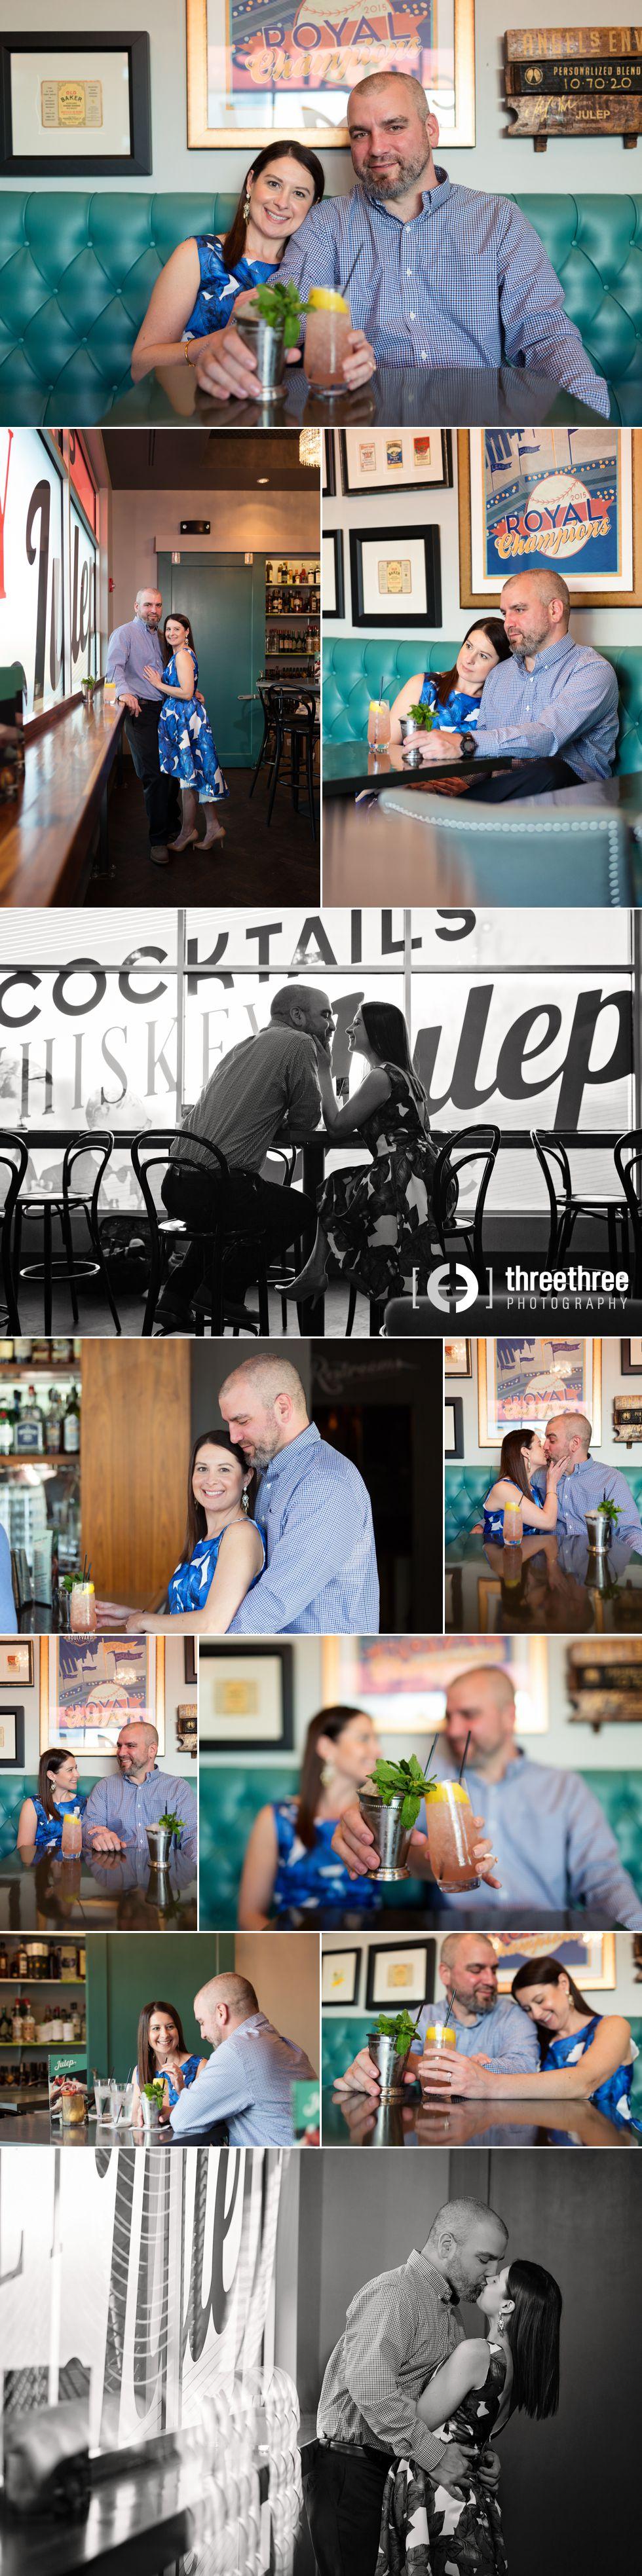 Adrienne-Eng-Blog-1.jpg